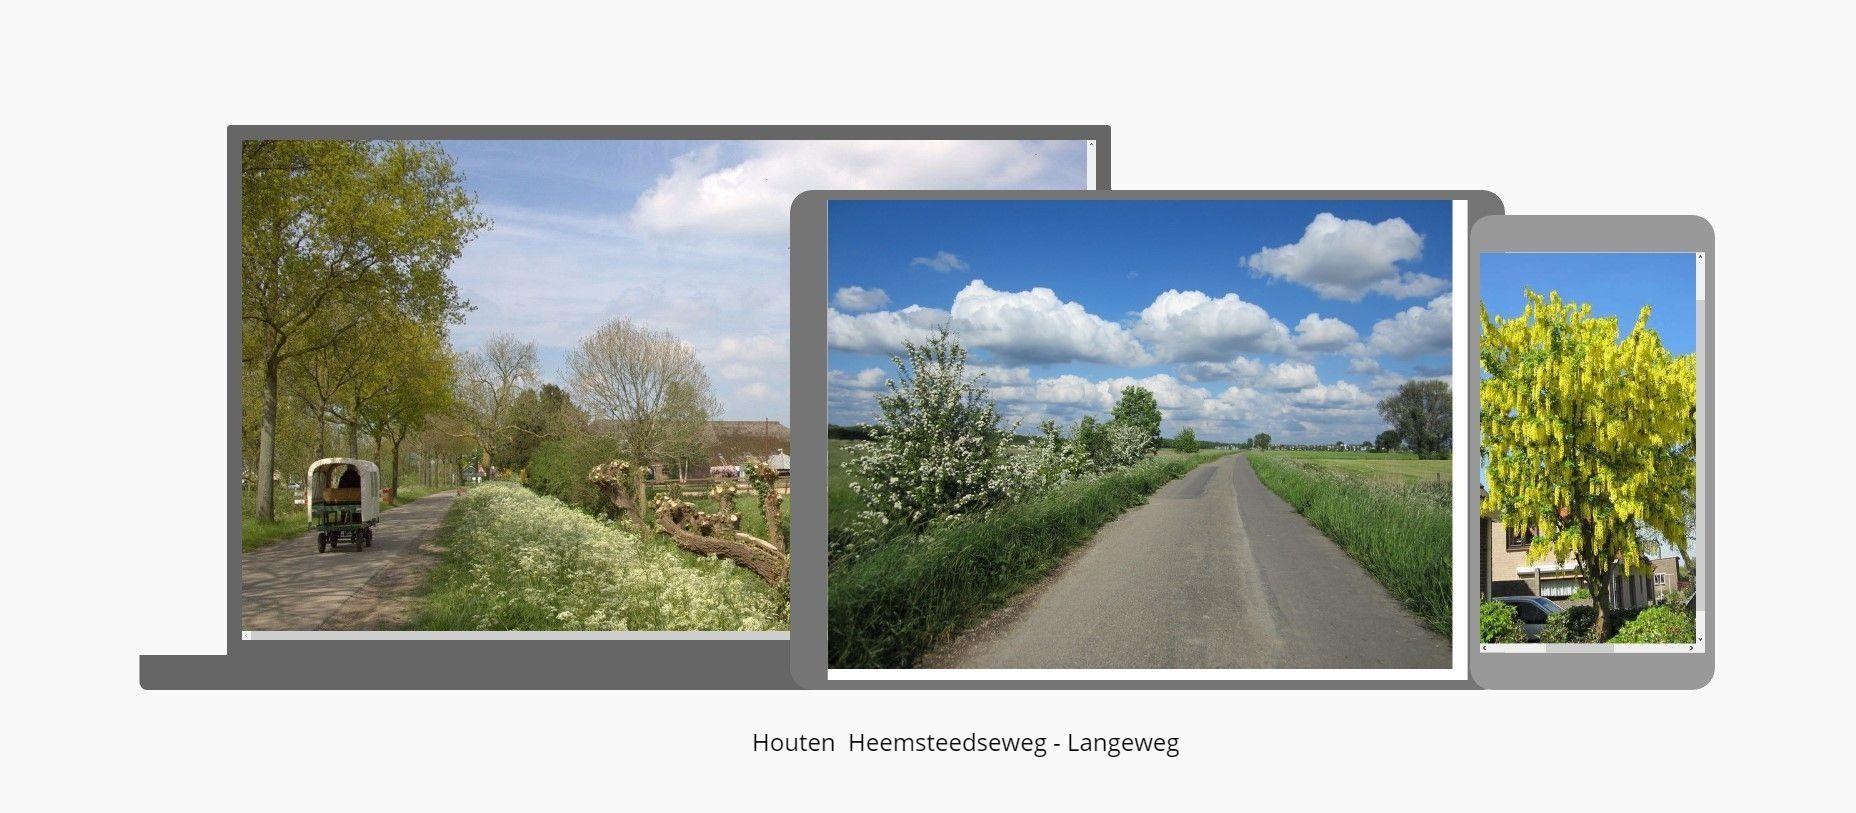 Heemsteedseweg - Langeweg - Golden rain tree